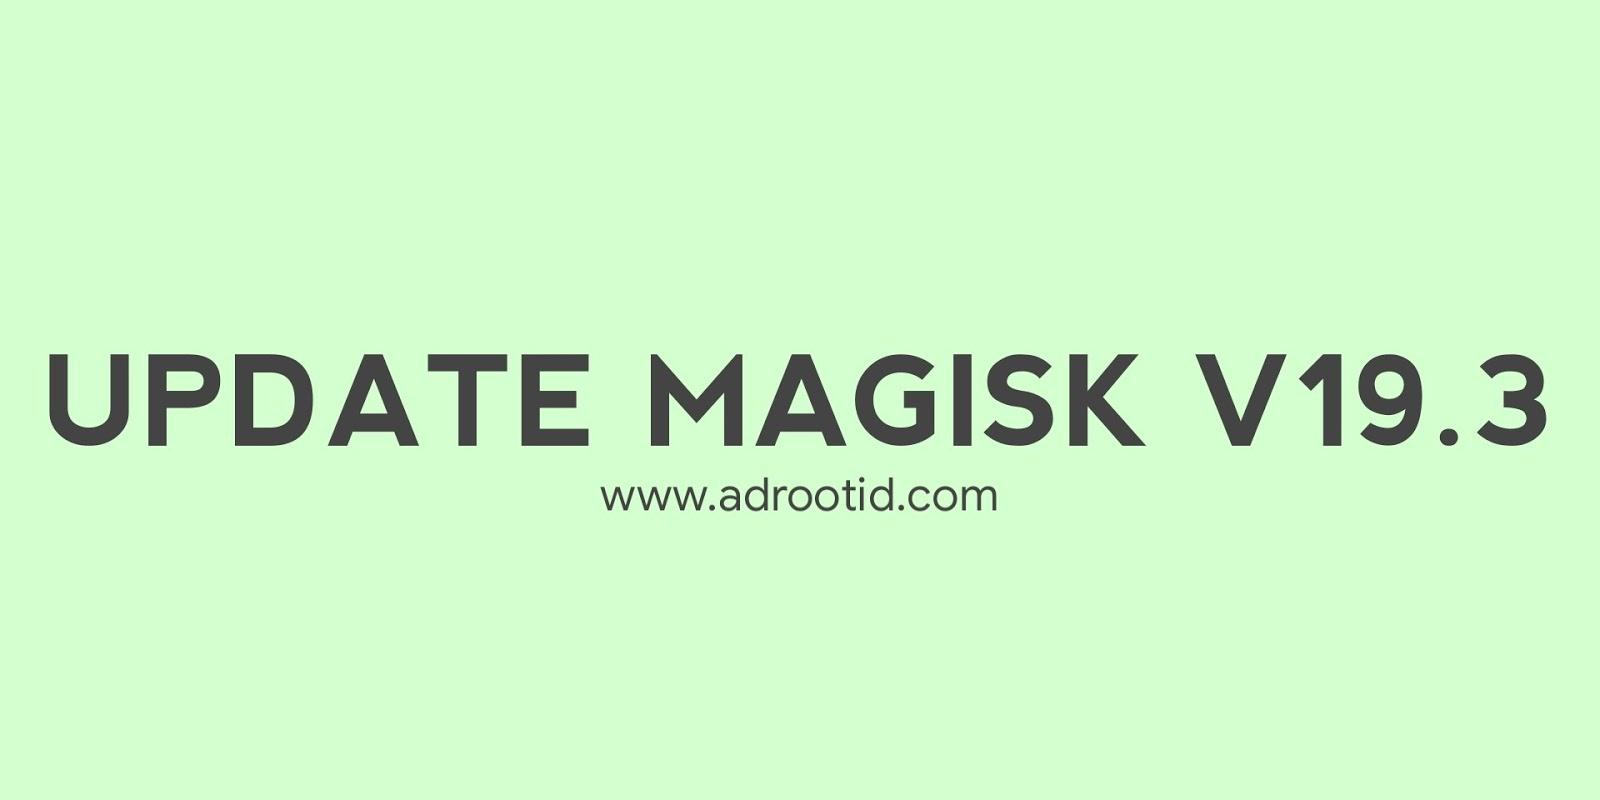 Magisk 19.3